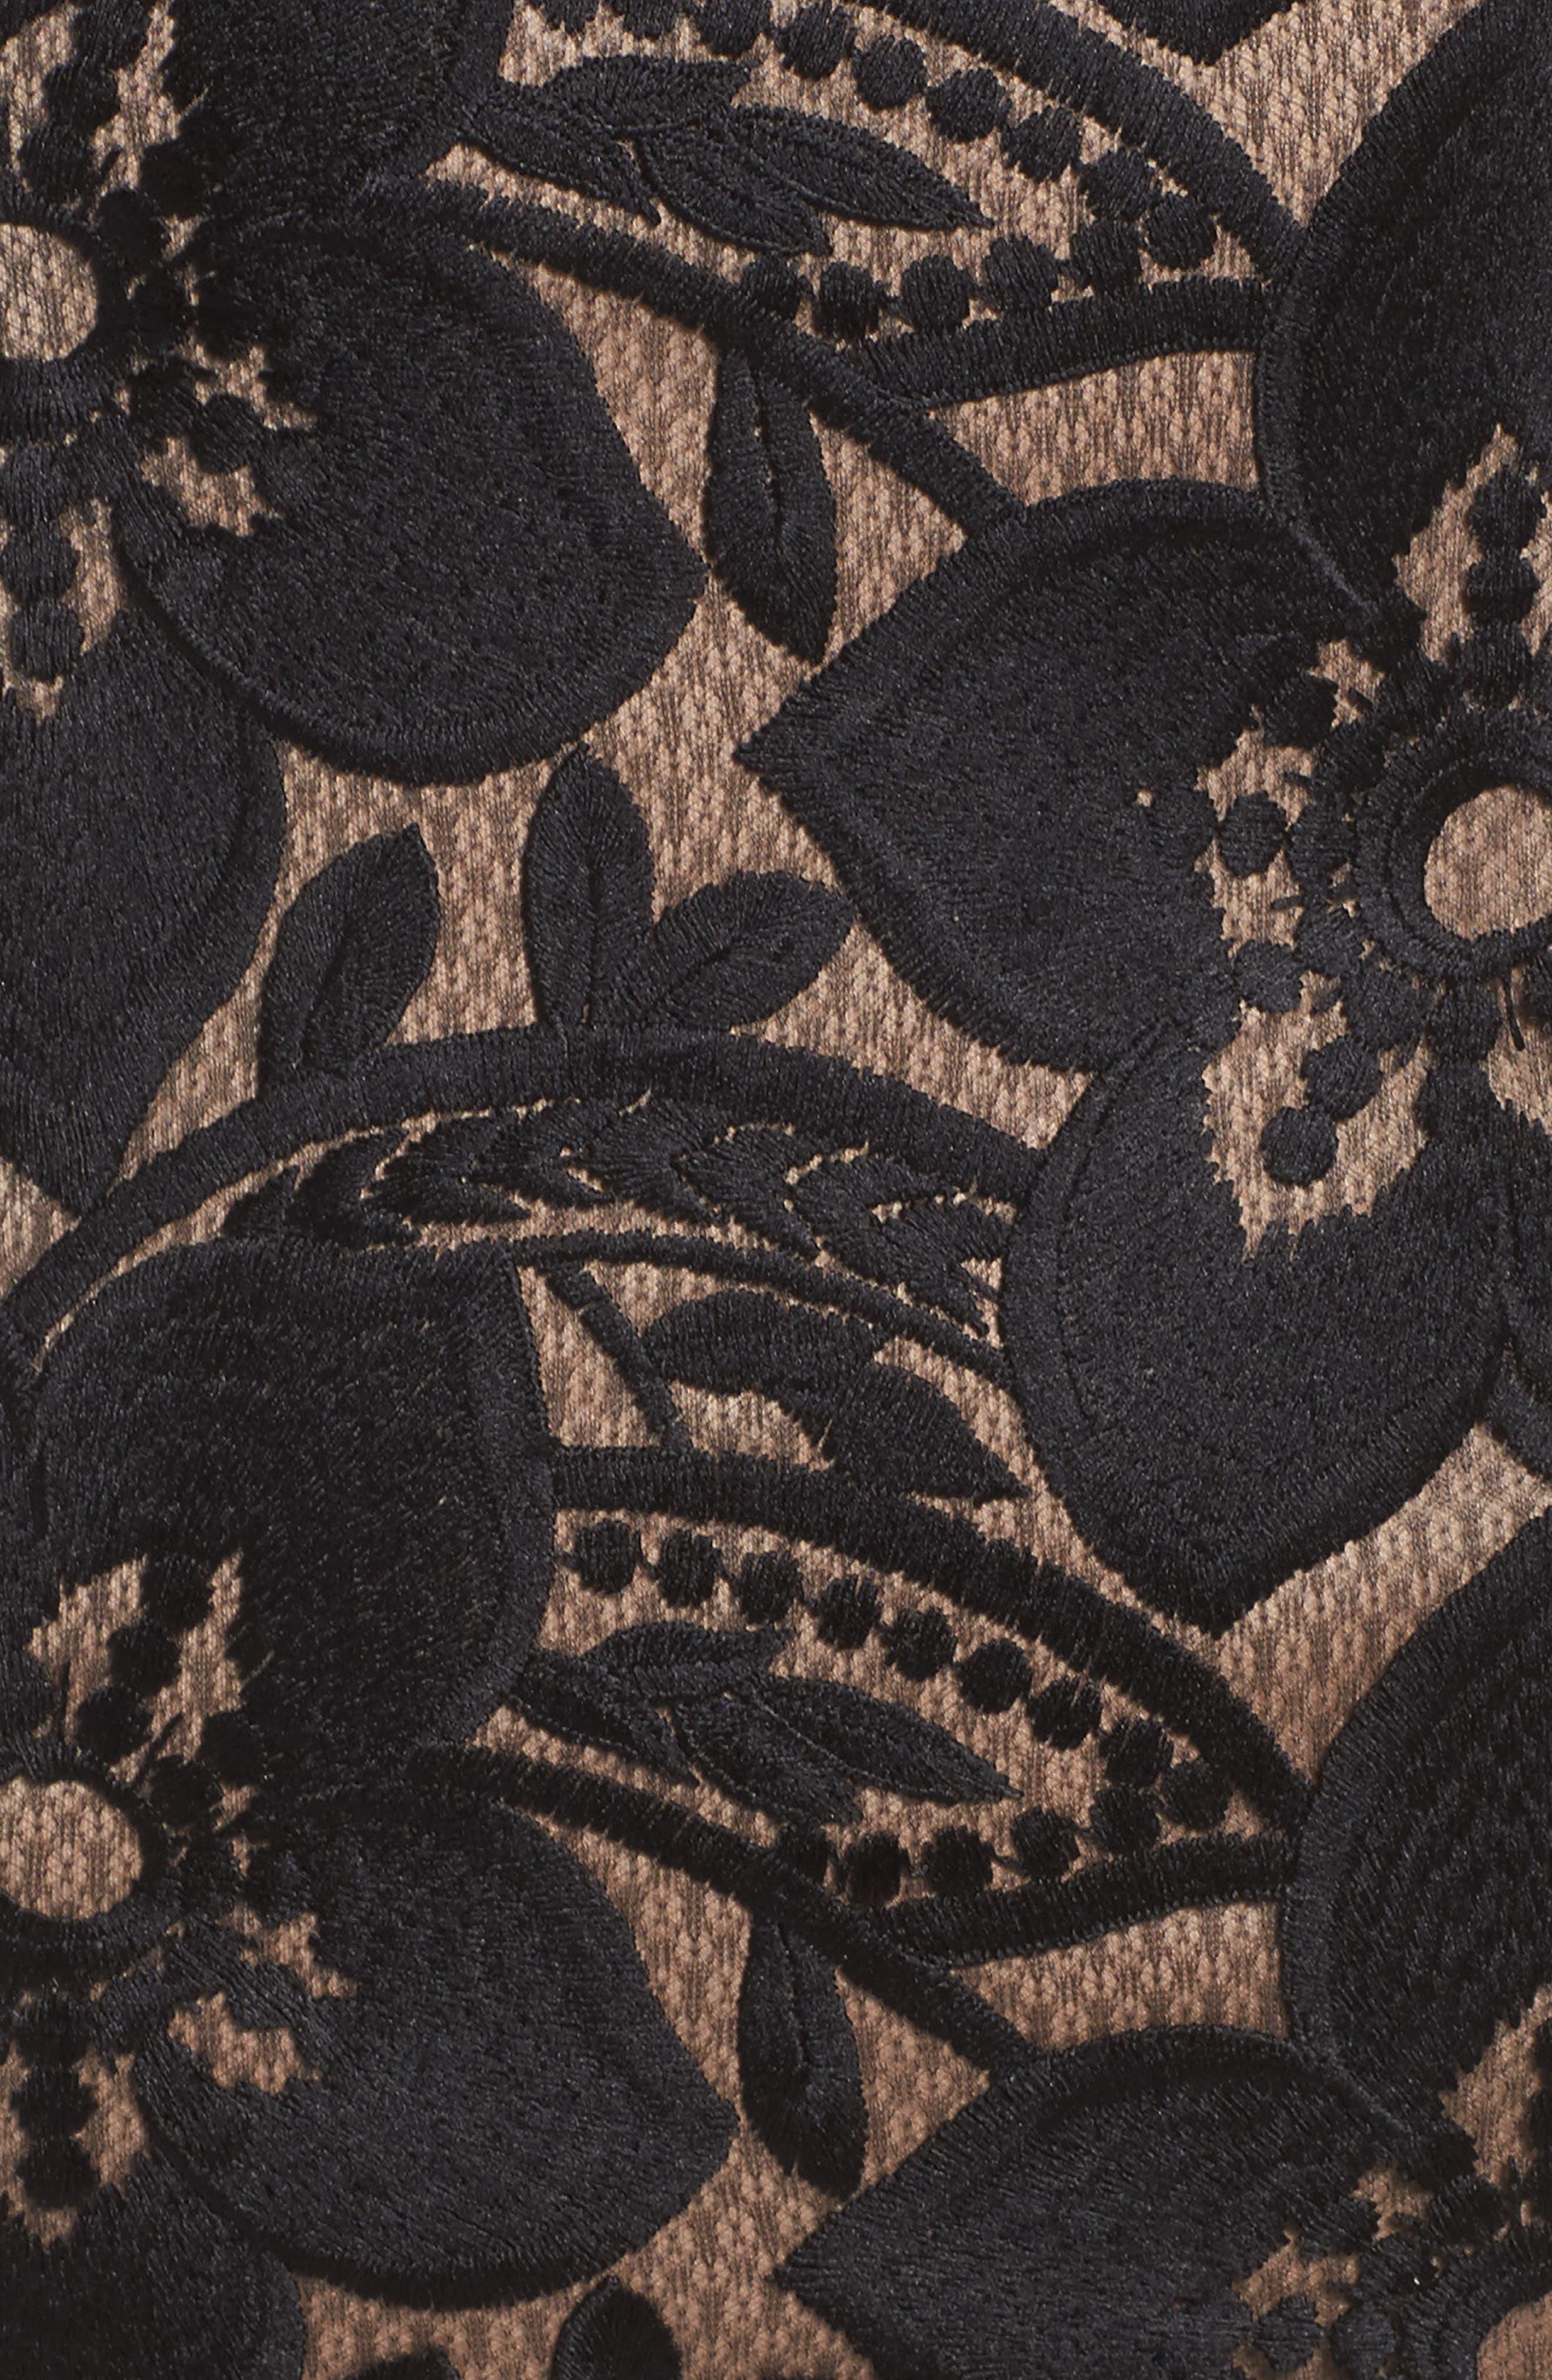 Lace Sheath Dress,                             Alternate thumbnail 5, color,                             002